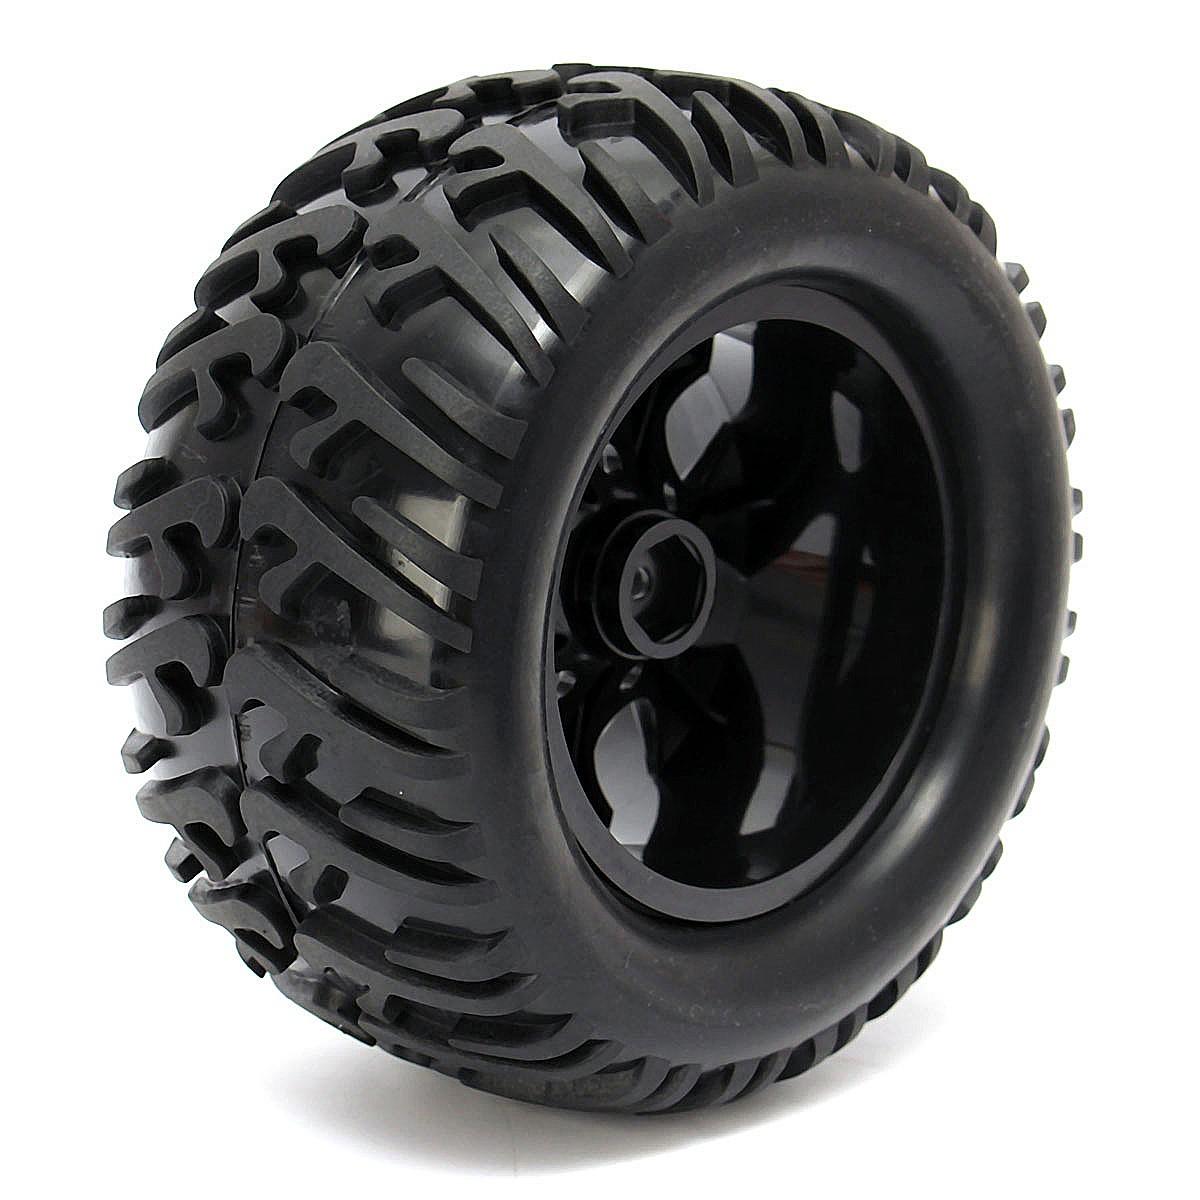 4PCS Wheel Rim & Tires HSP 1:10 Monster Truck RC Car 12mm Hub 88005